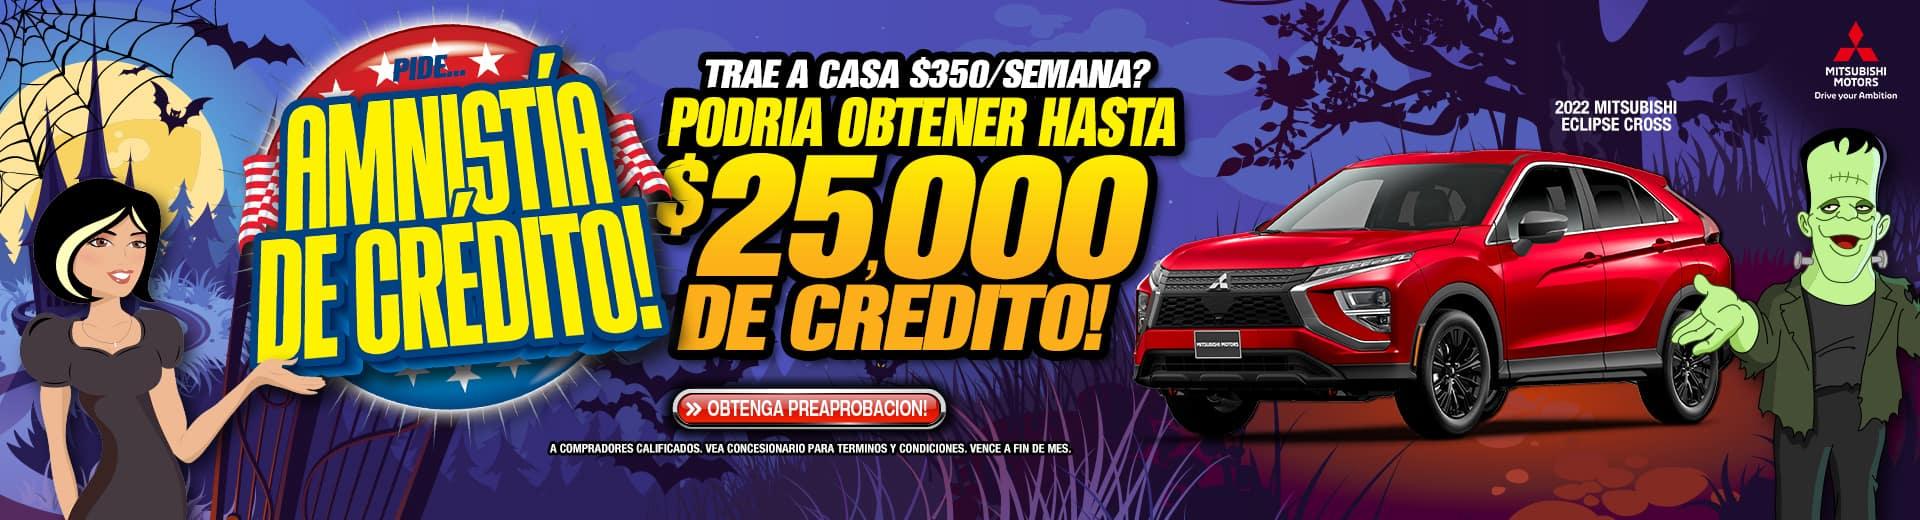 SMR_Spanish_CreditAmnesty_1920x520_Slider_101221